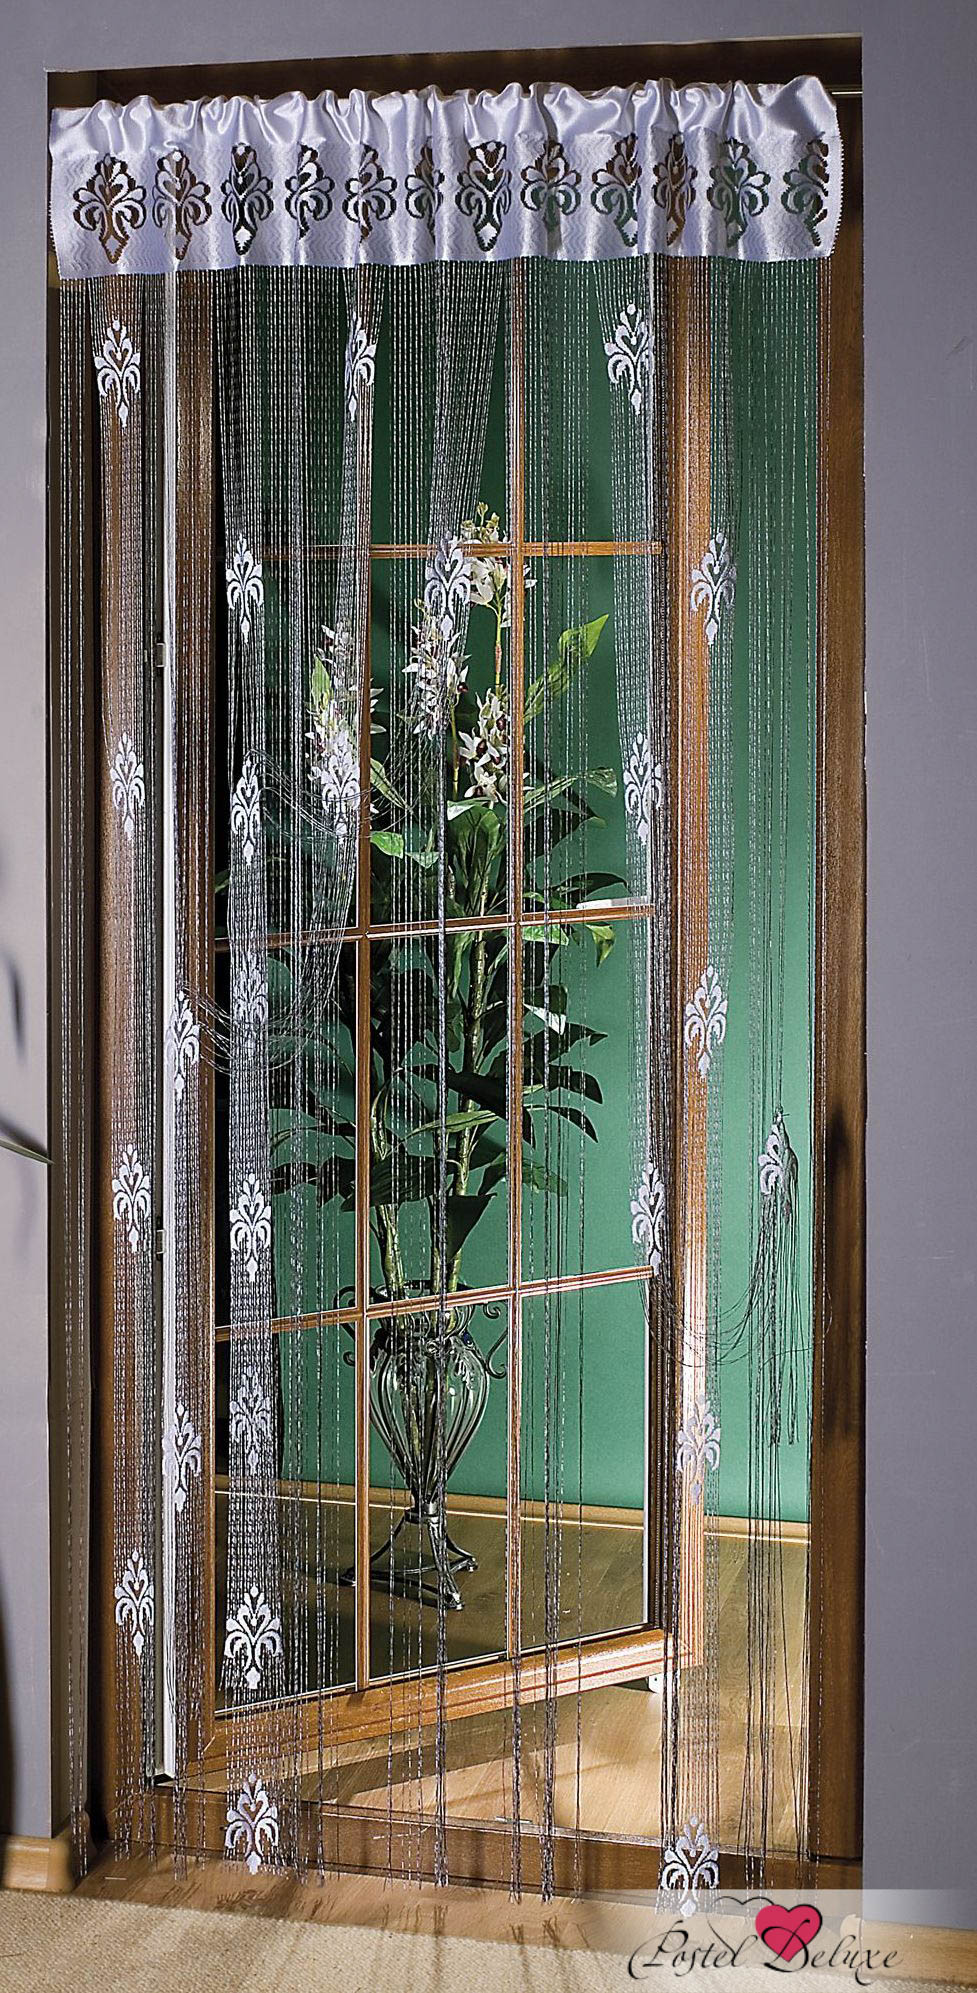 Шторы Wisan Нитяные шторы Joshua Цвет: Серебро шторы wisan нитяные шторы odelia